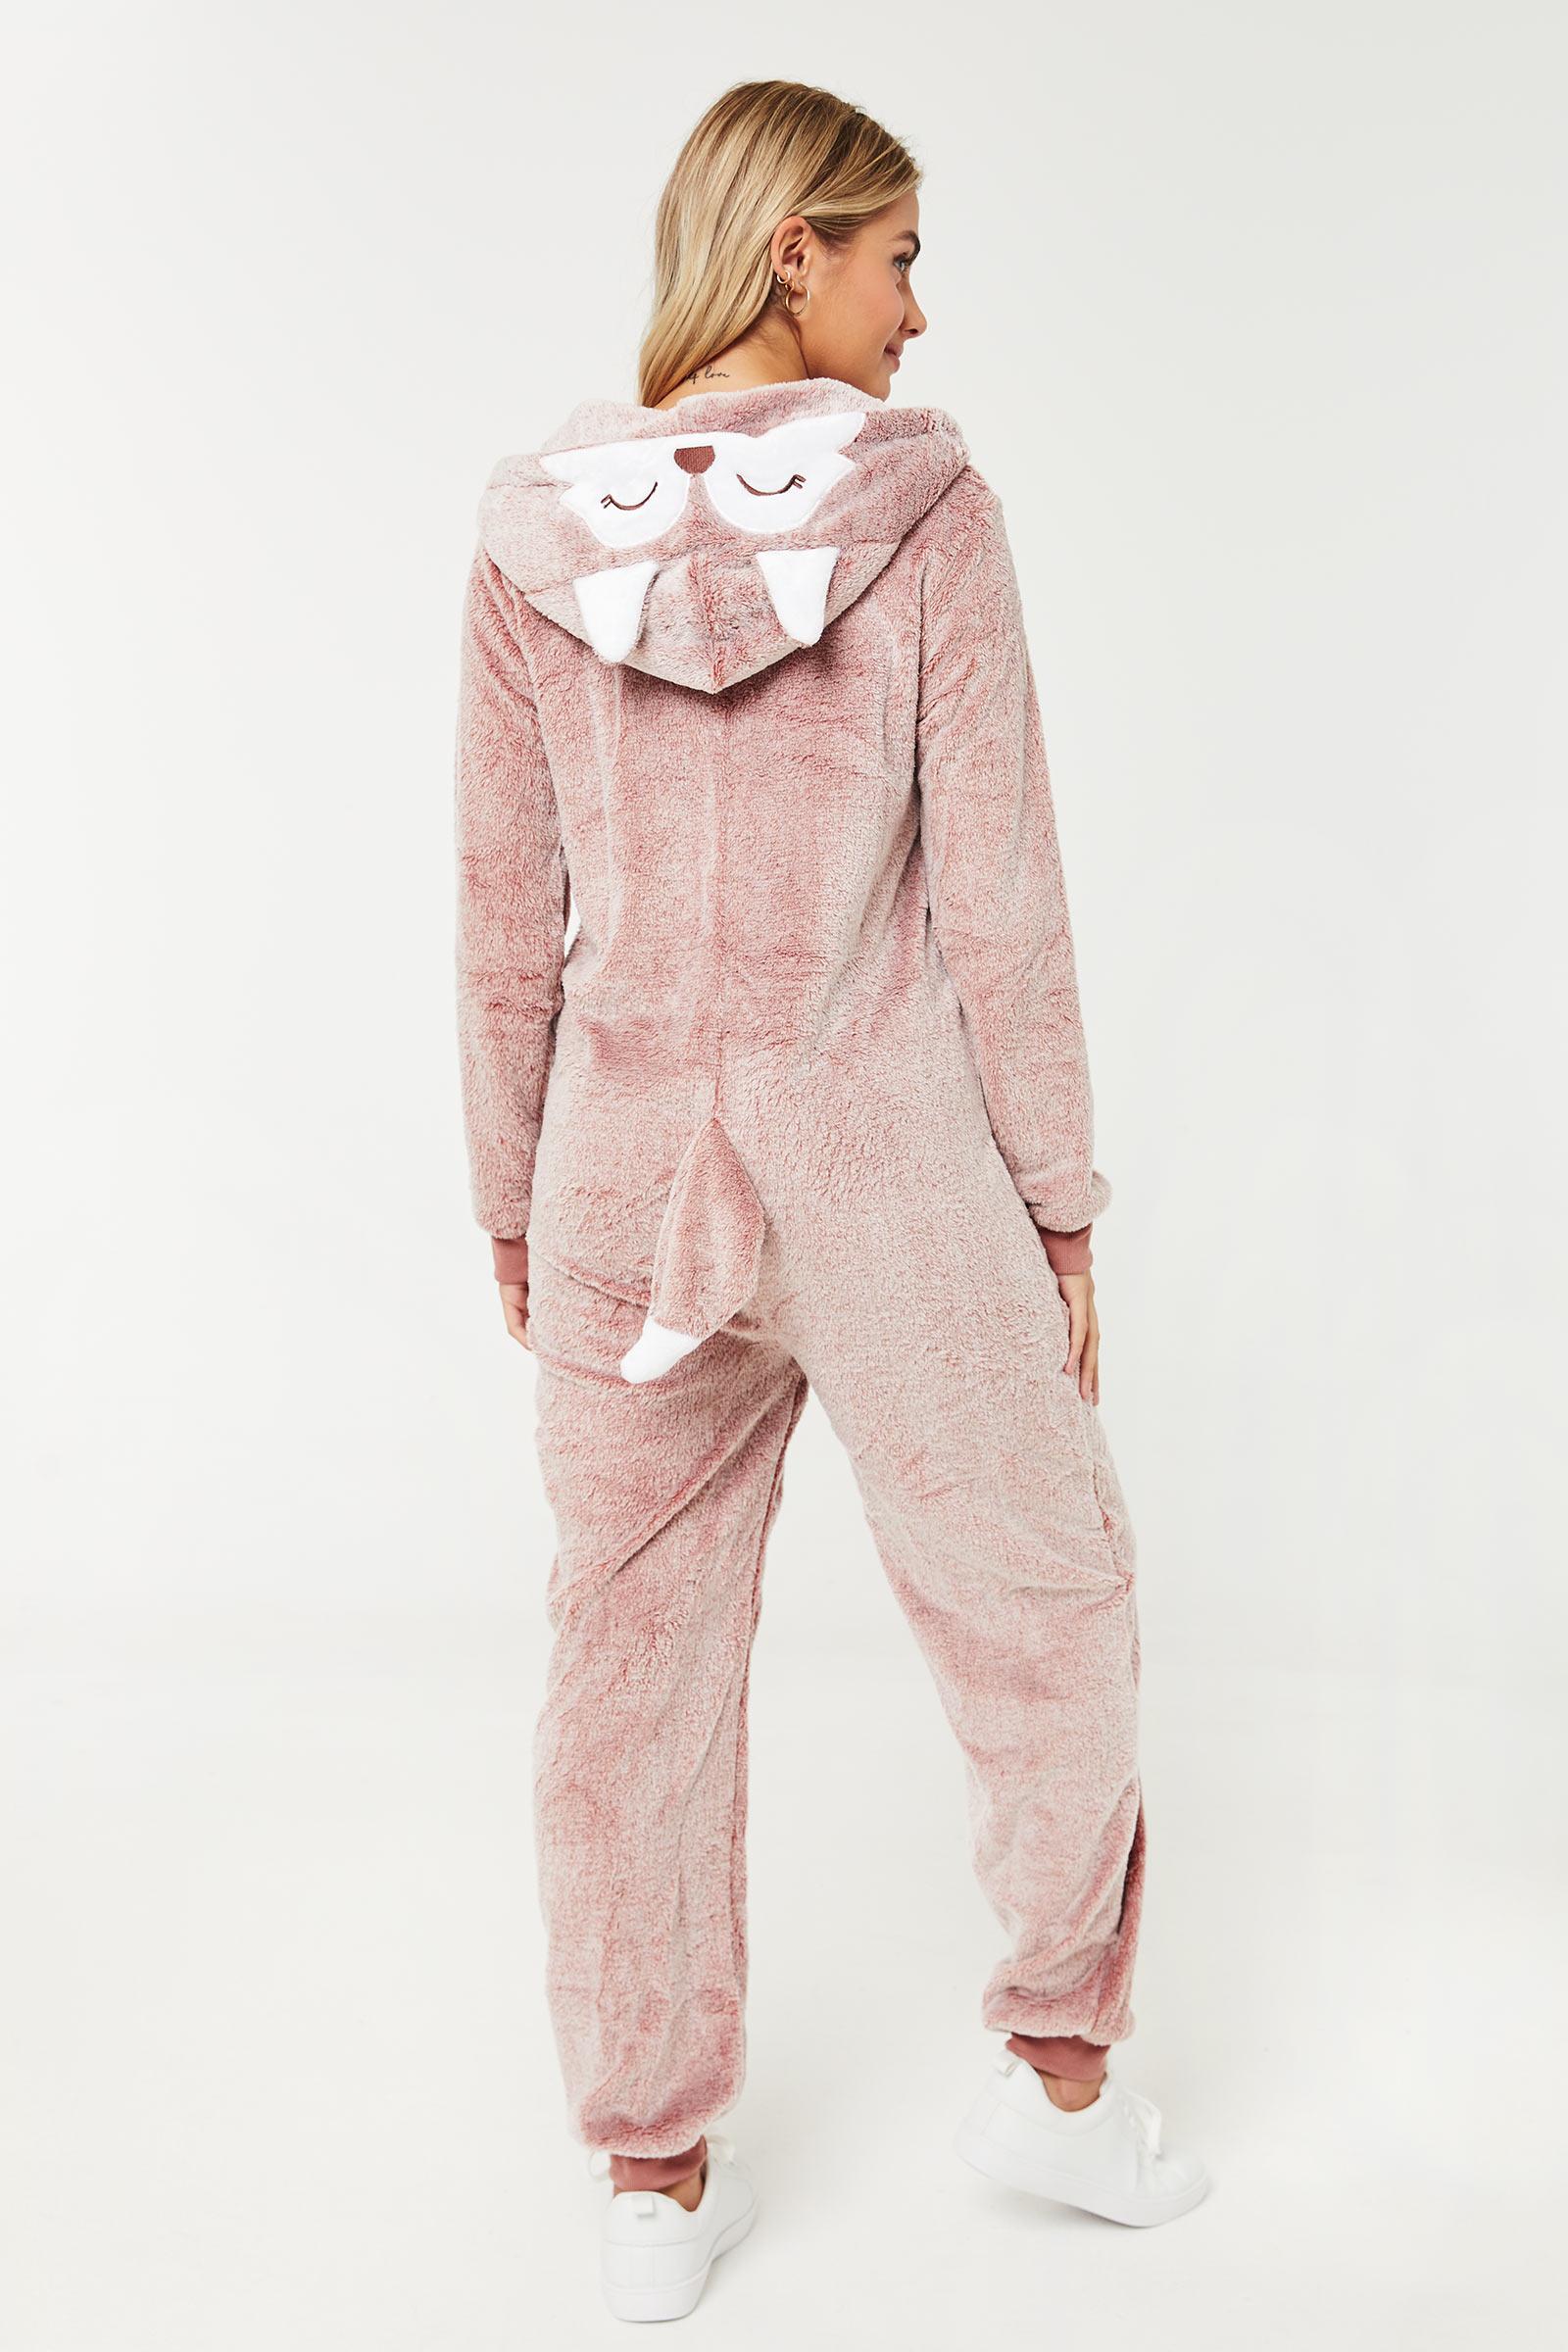 Costume une-pièce de renard